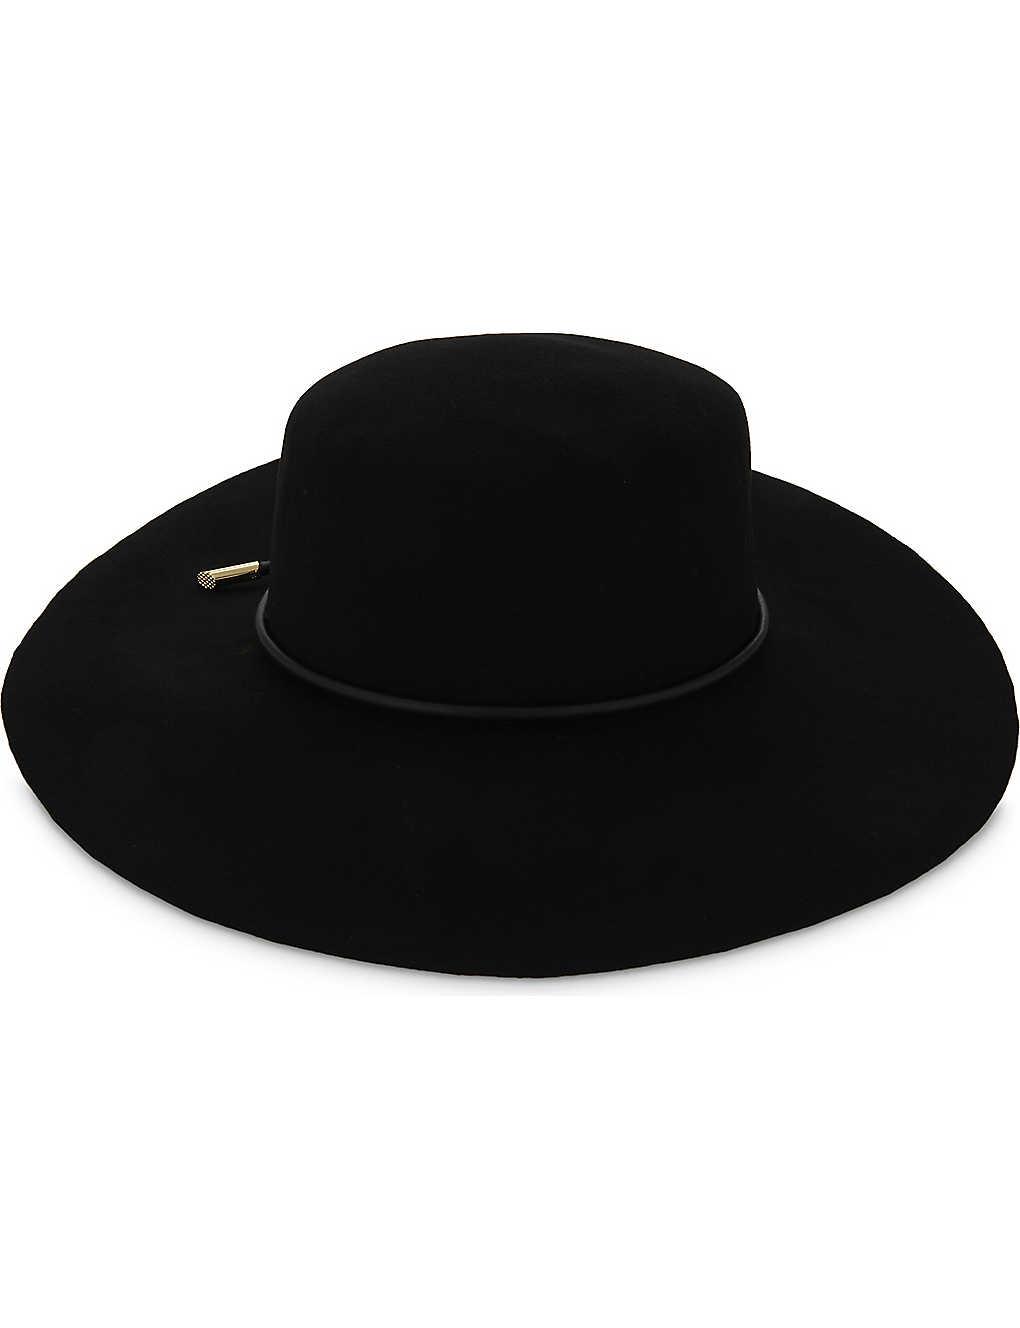 6229b79f0c85b TED BAKER - Alizza rope trim flat-brimmed hat